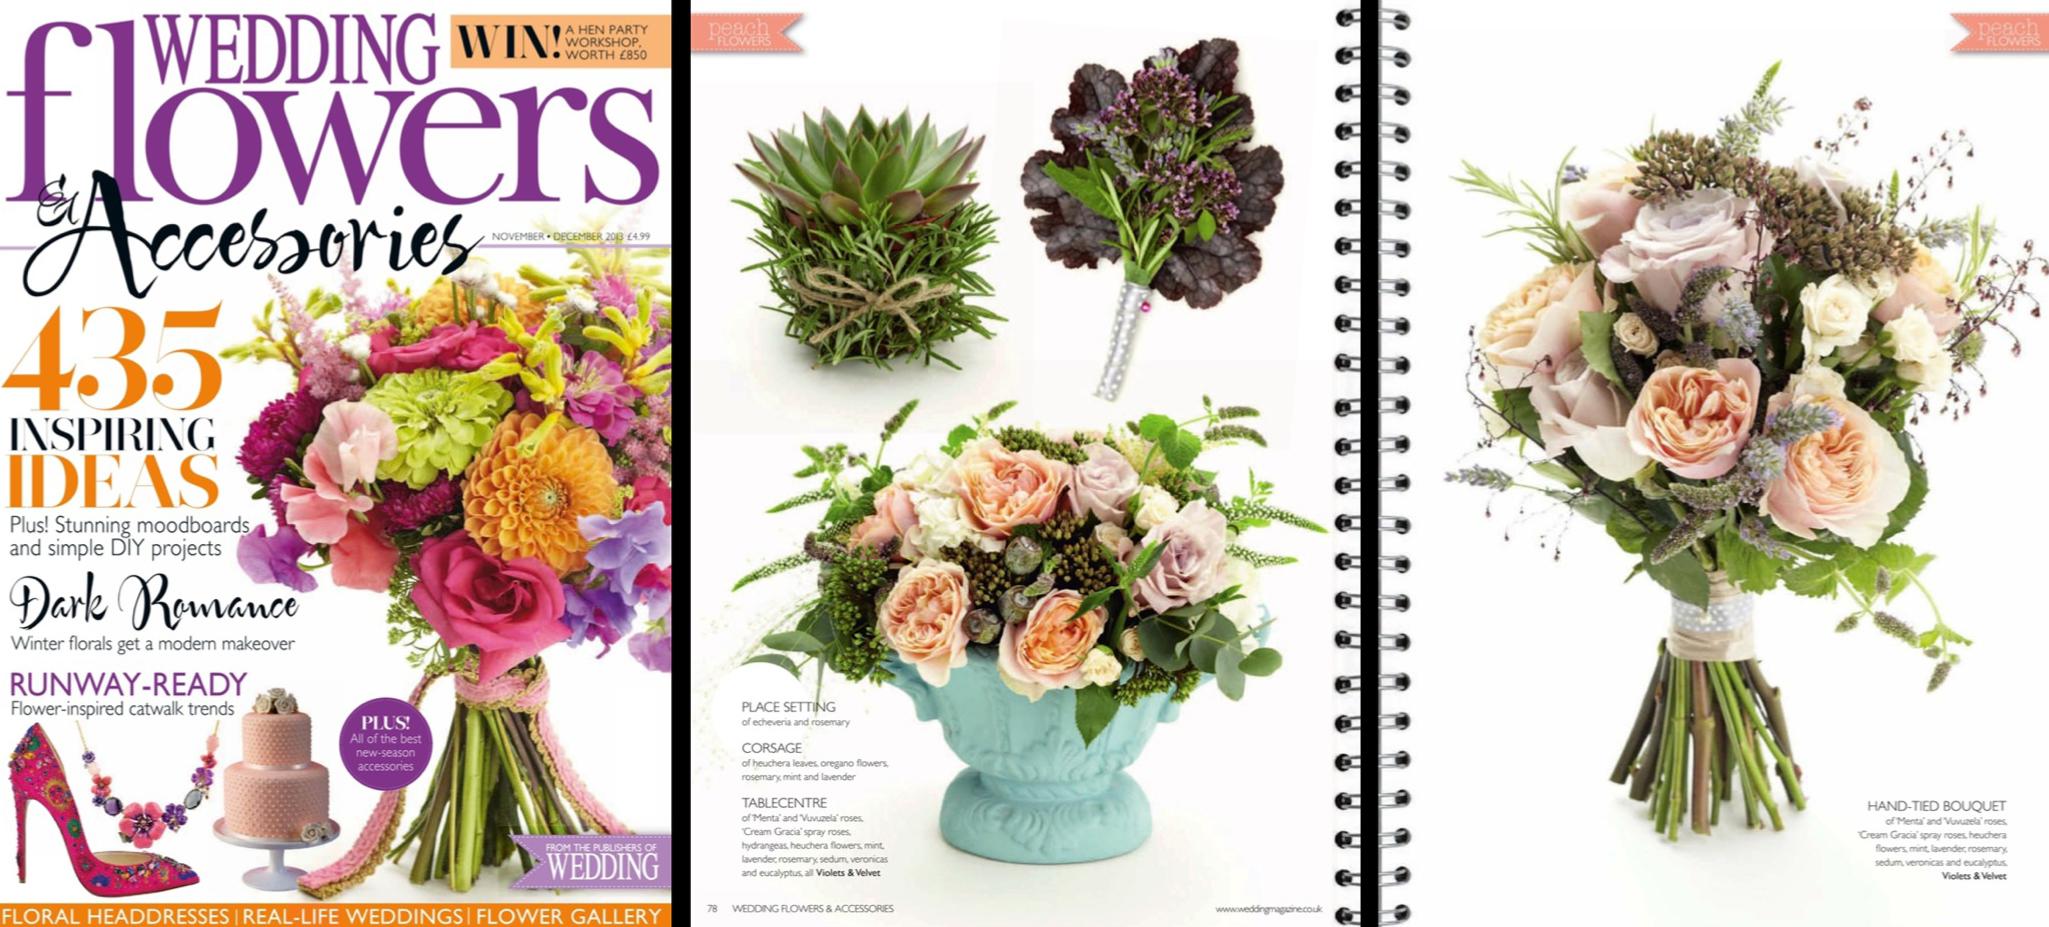 Wedding Flowers & Accessories Nov:Dec 2-13.jpg